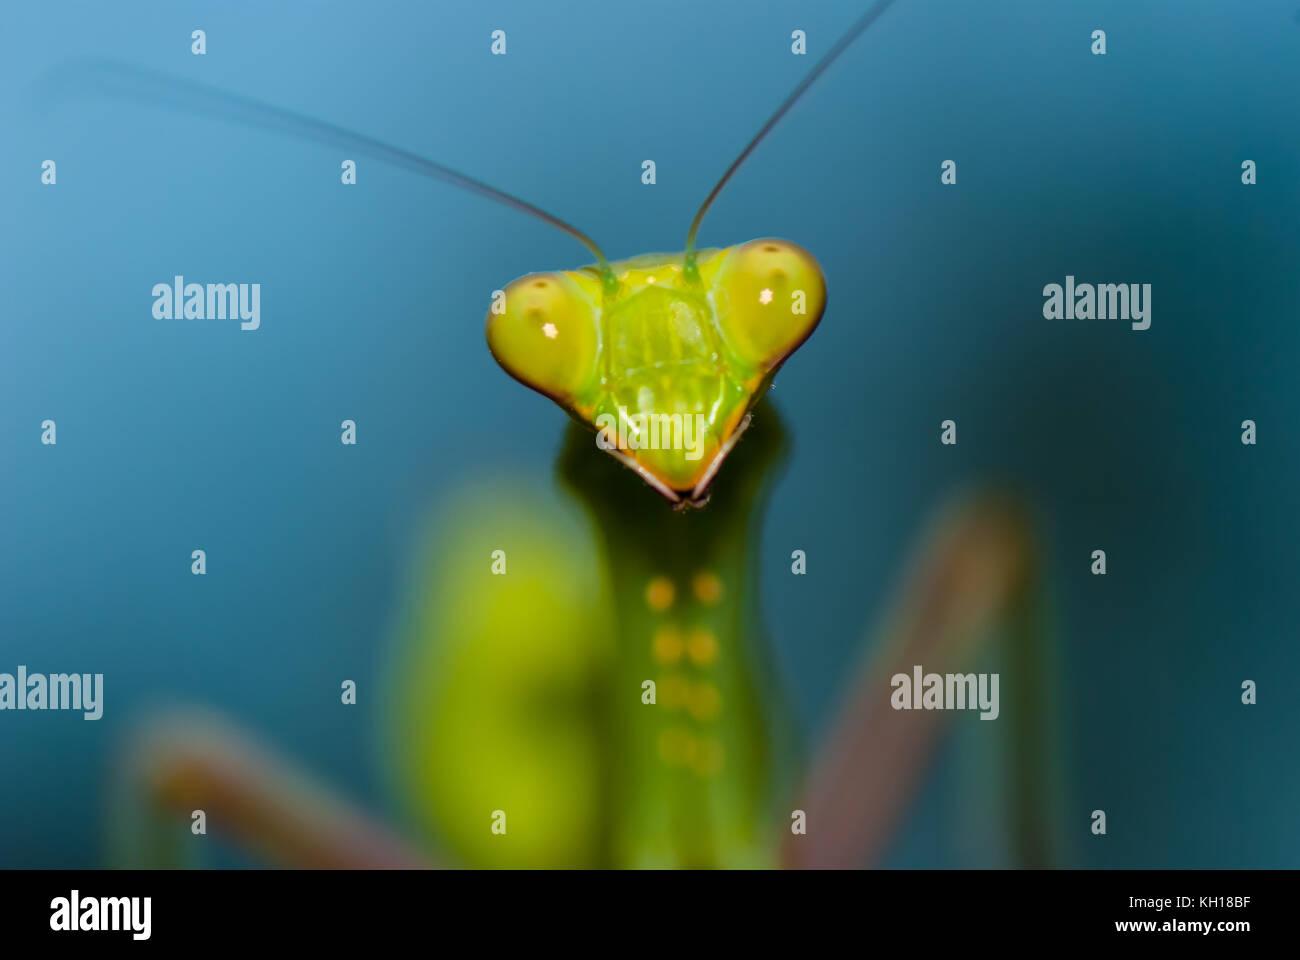 Grüne Gottesanbeterin. Stockfoto